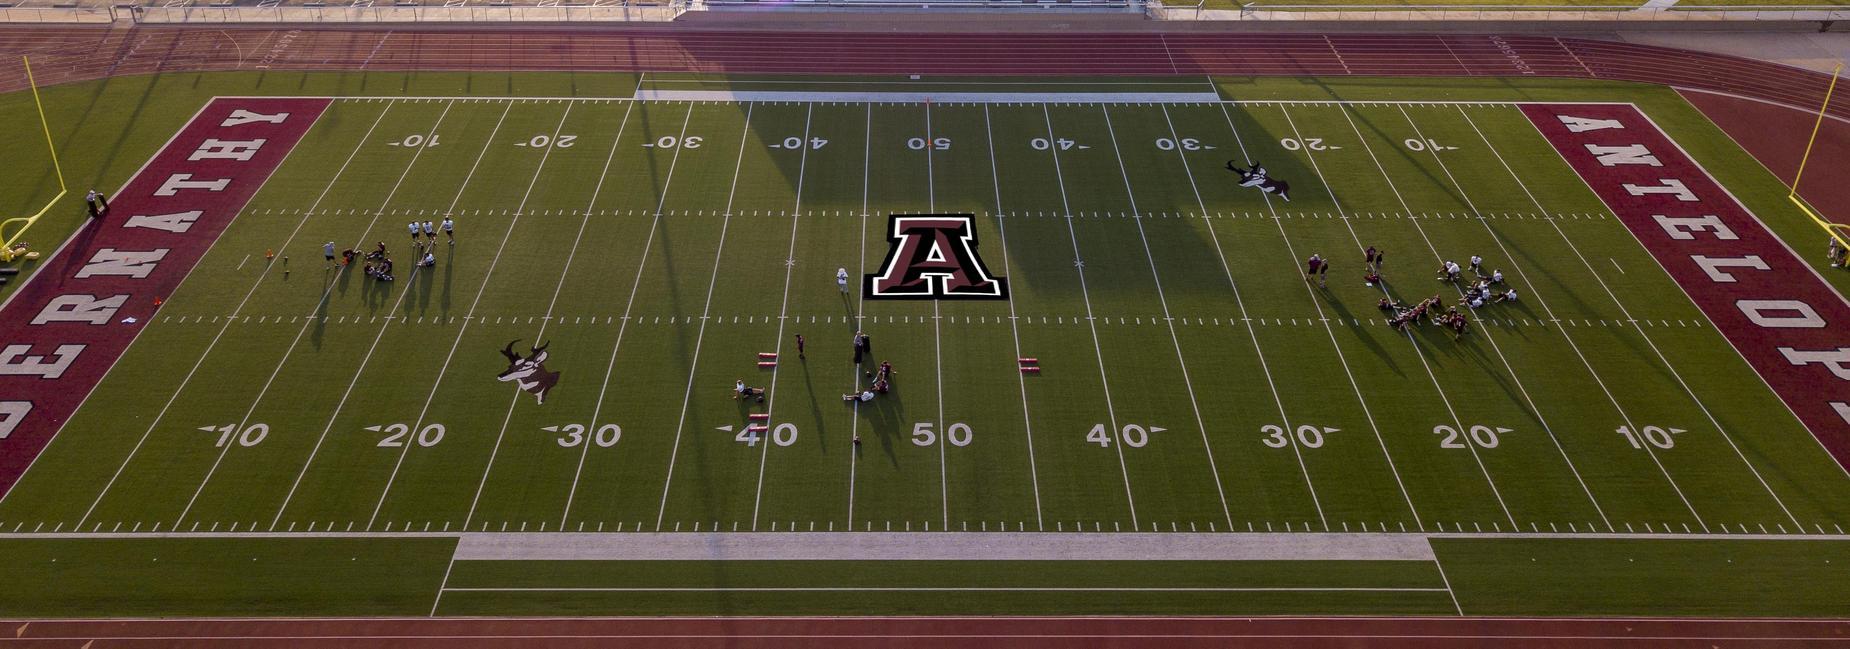 Abernathy Antelope Football field